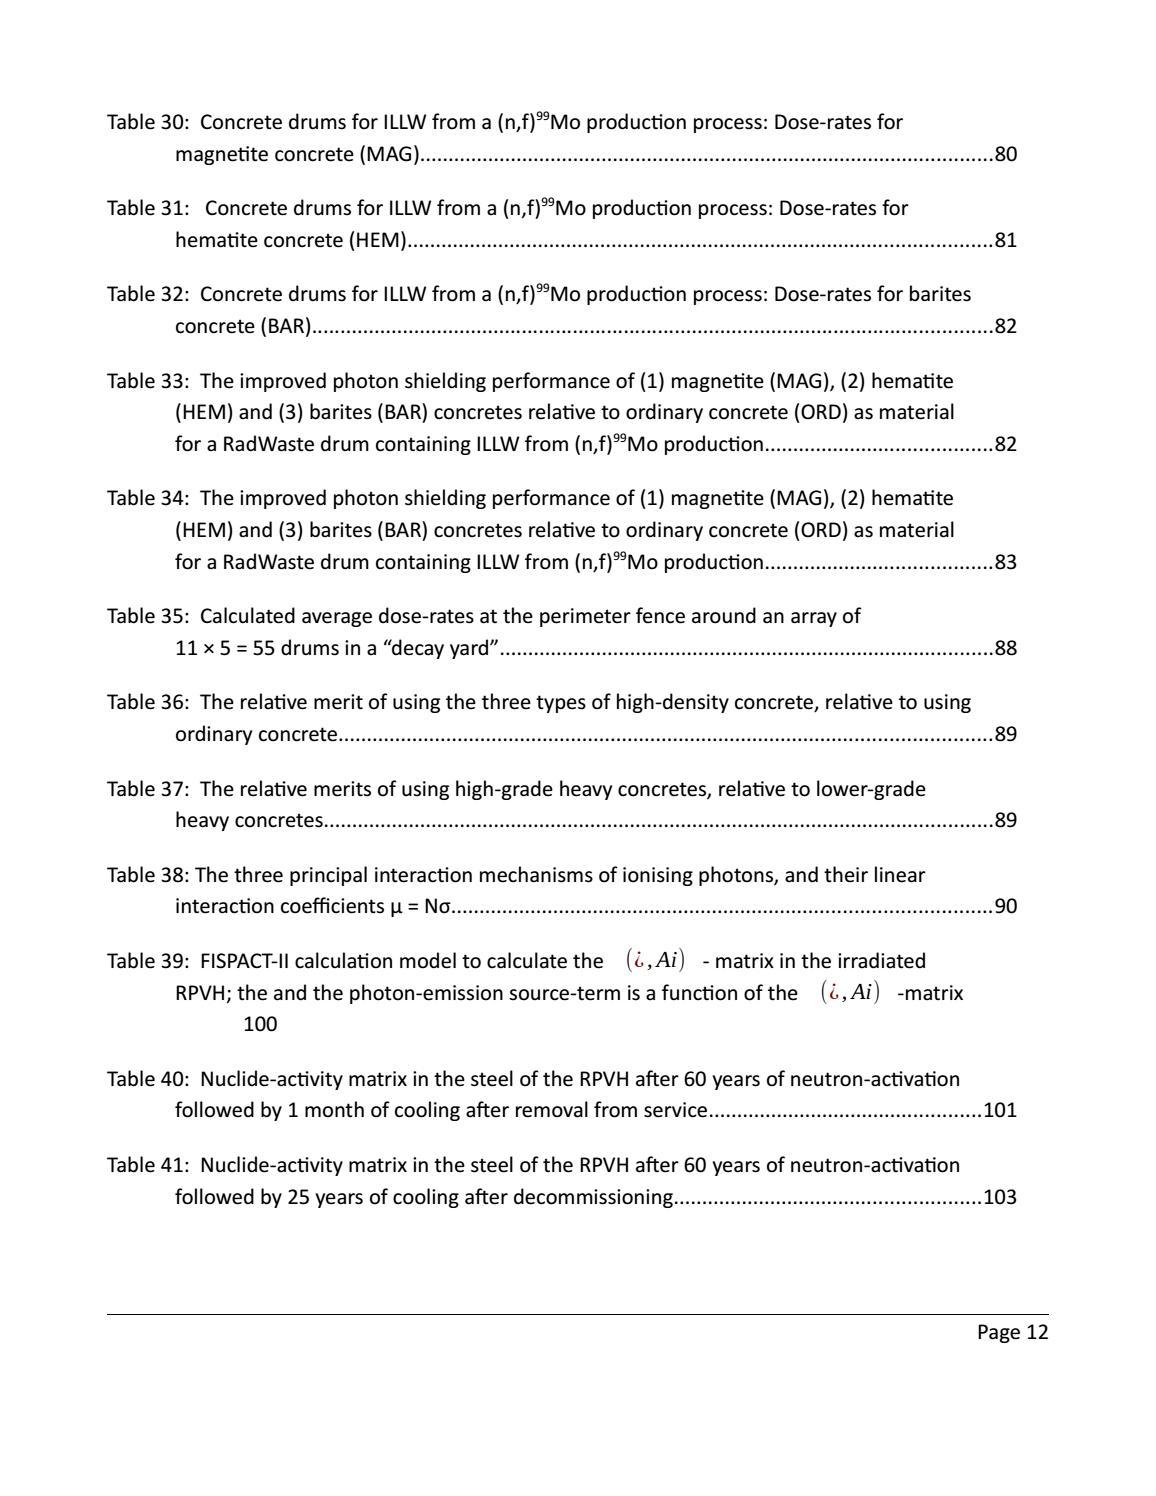 RADIOACTIVE WASTE: COMPUTATIONAL CHARACTERISATION and SHIELDING page 12